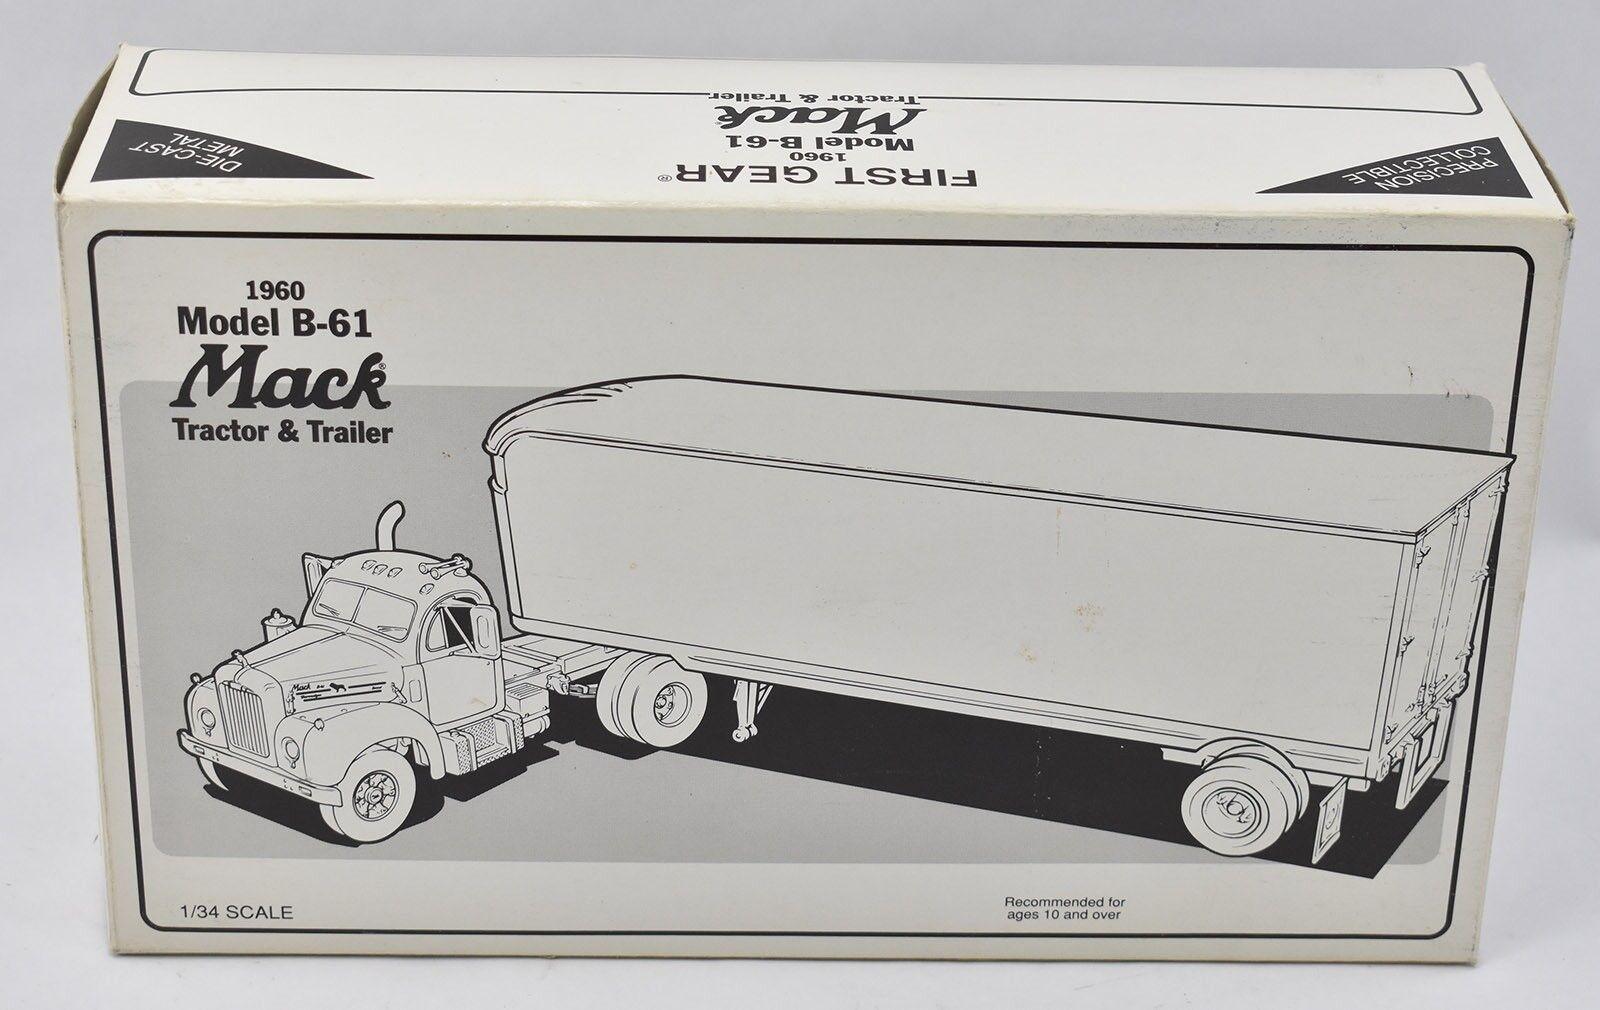 1960 Modelo B-61 Mack remolque de tractor Smith & Wesson 1 34 First Gear 1994